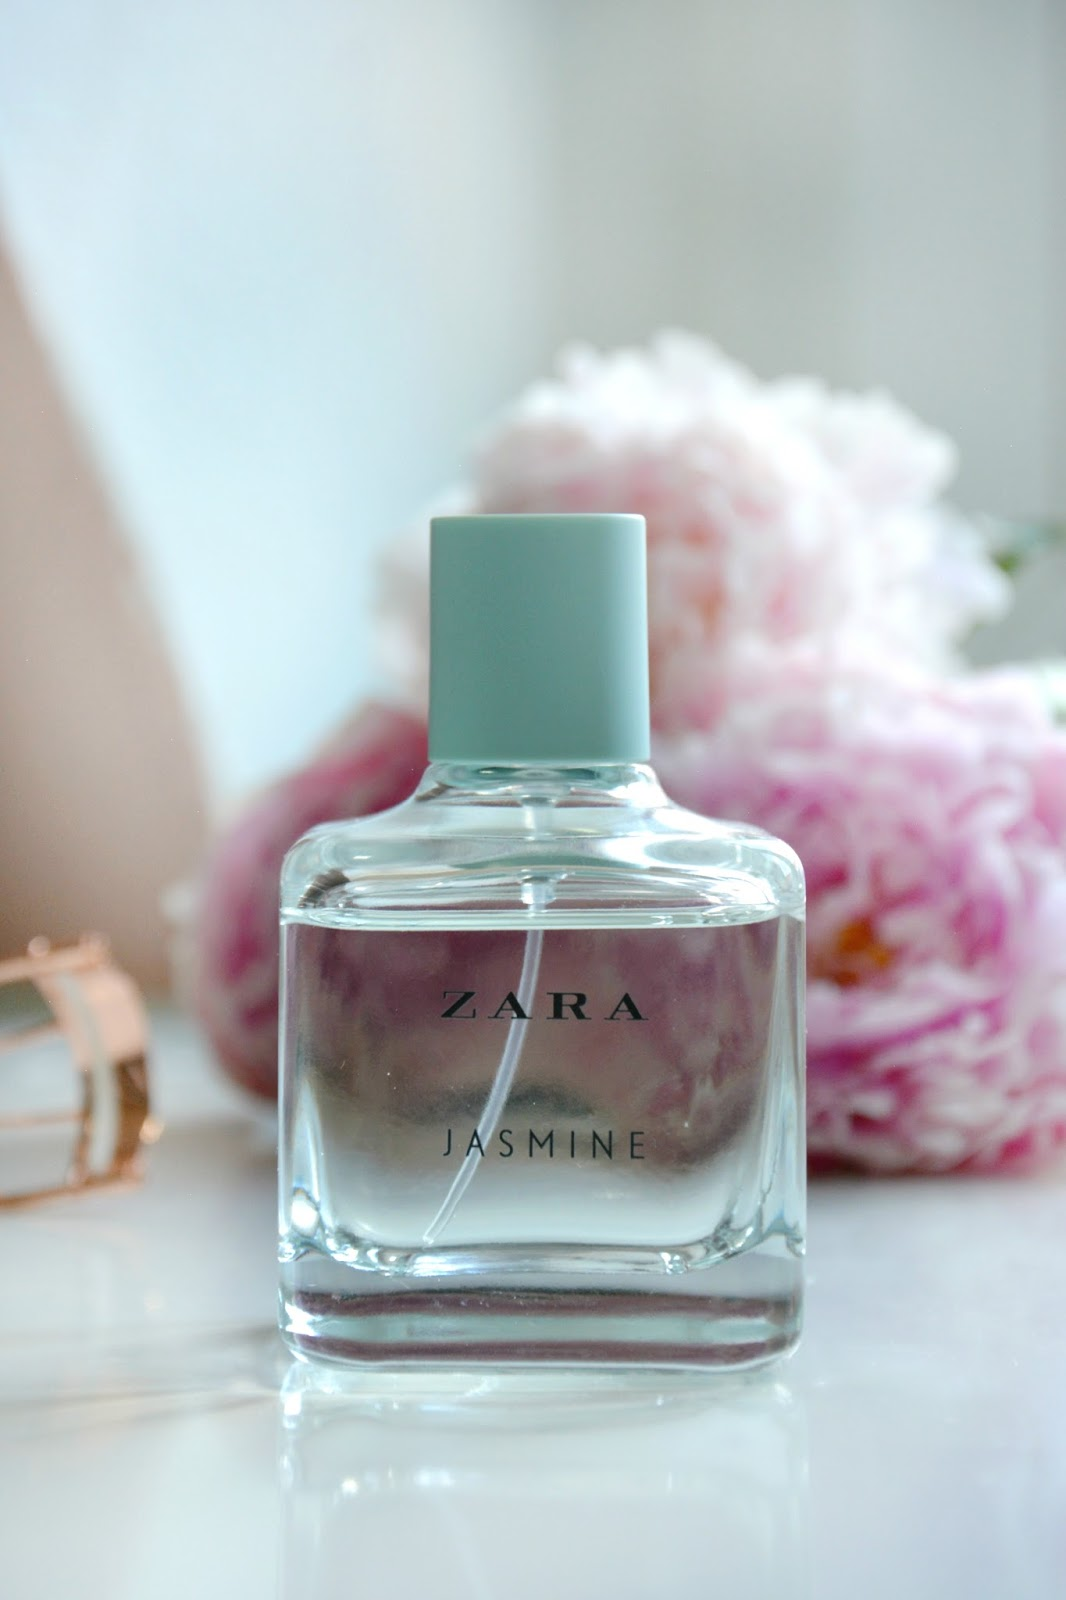 Zara Jasmine Eau de Perfume; Primark Eyelash Curler; Fresh Peonies